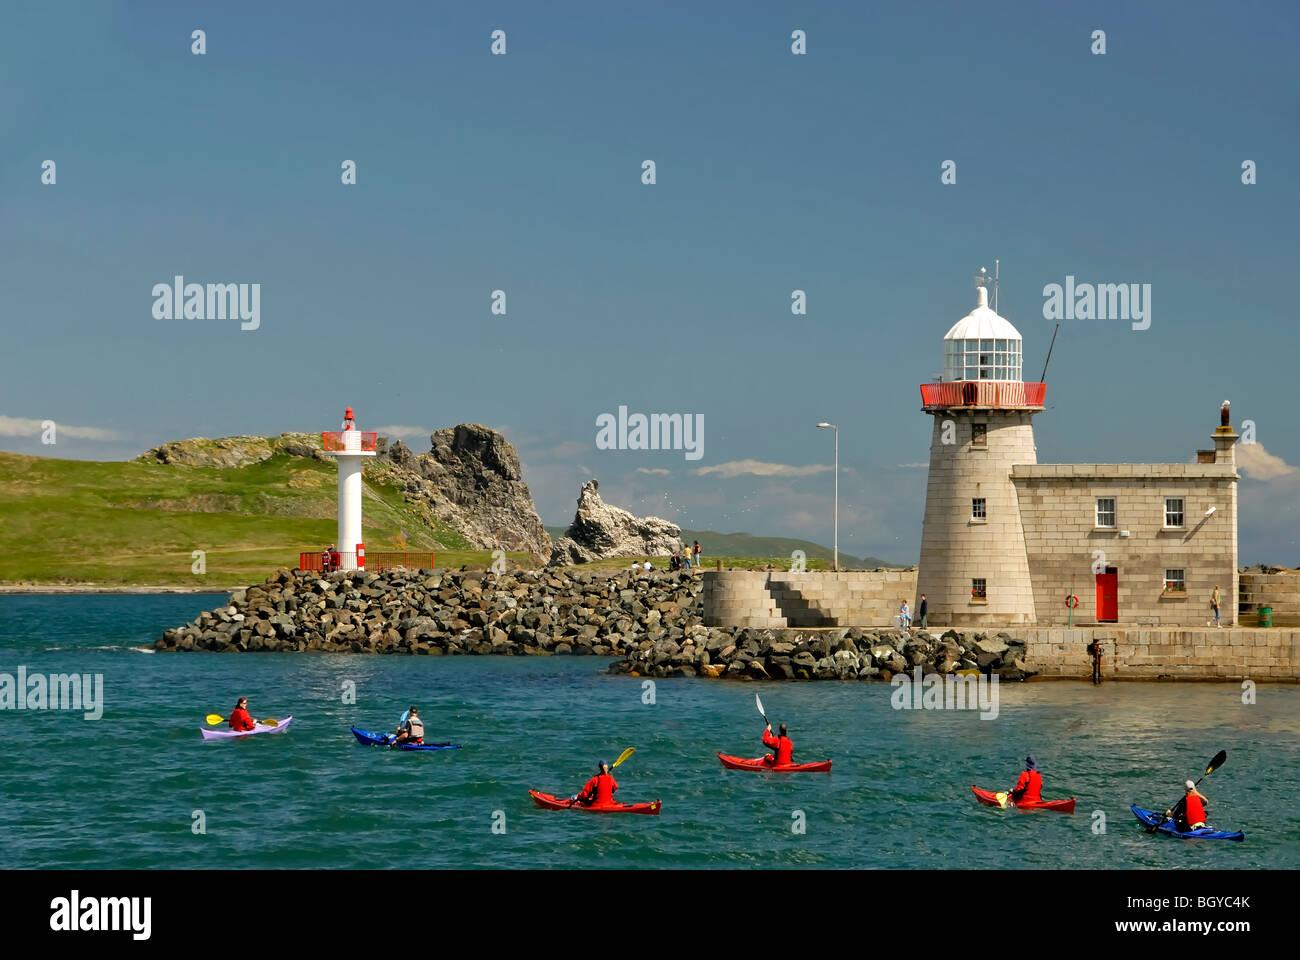 Seakayaking in Howth, Dublin Bay Ireland - Stock Image